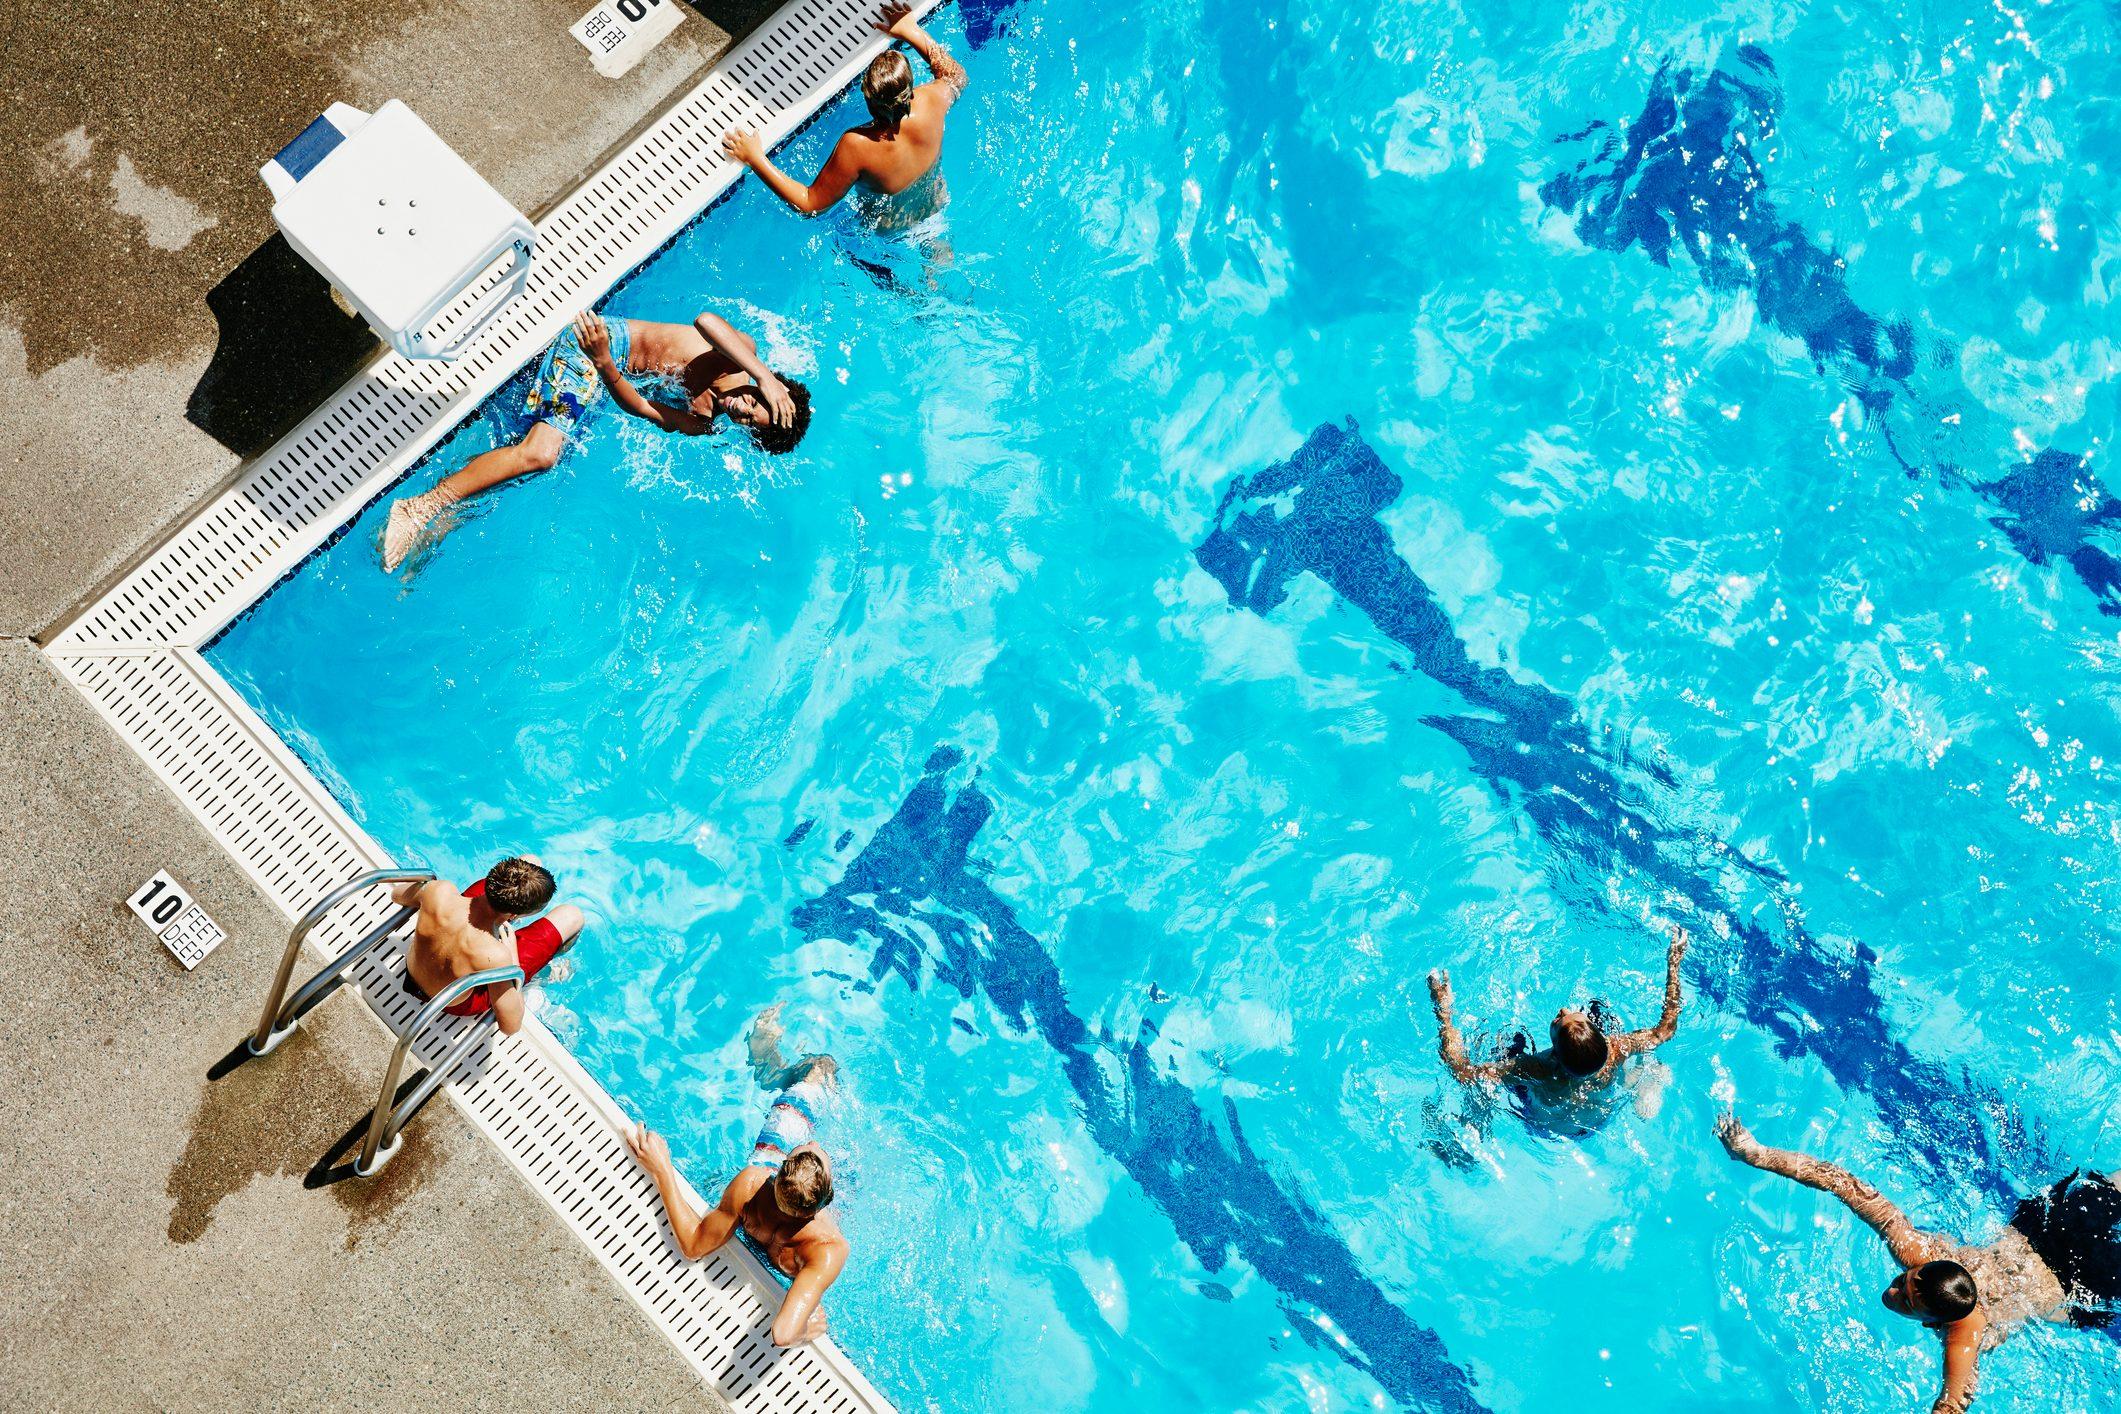 aerial shot of people in swimming pool